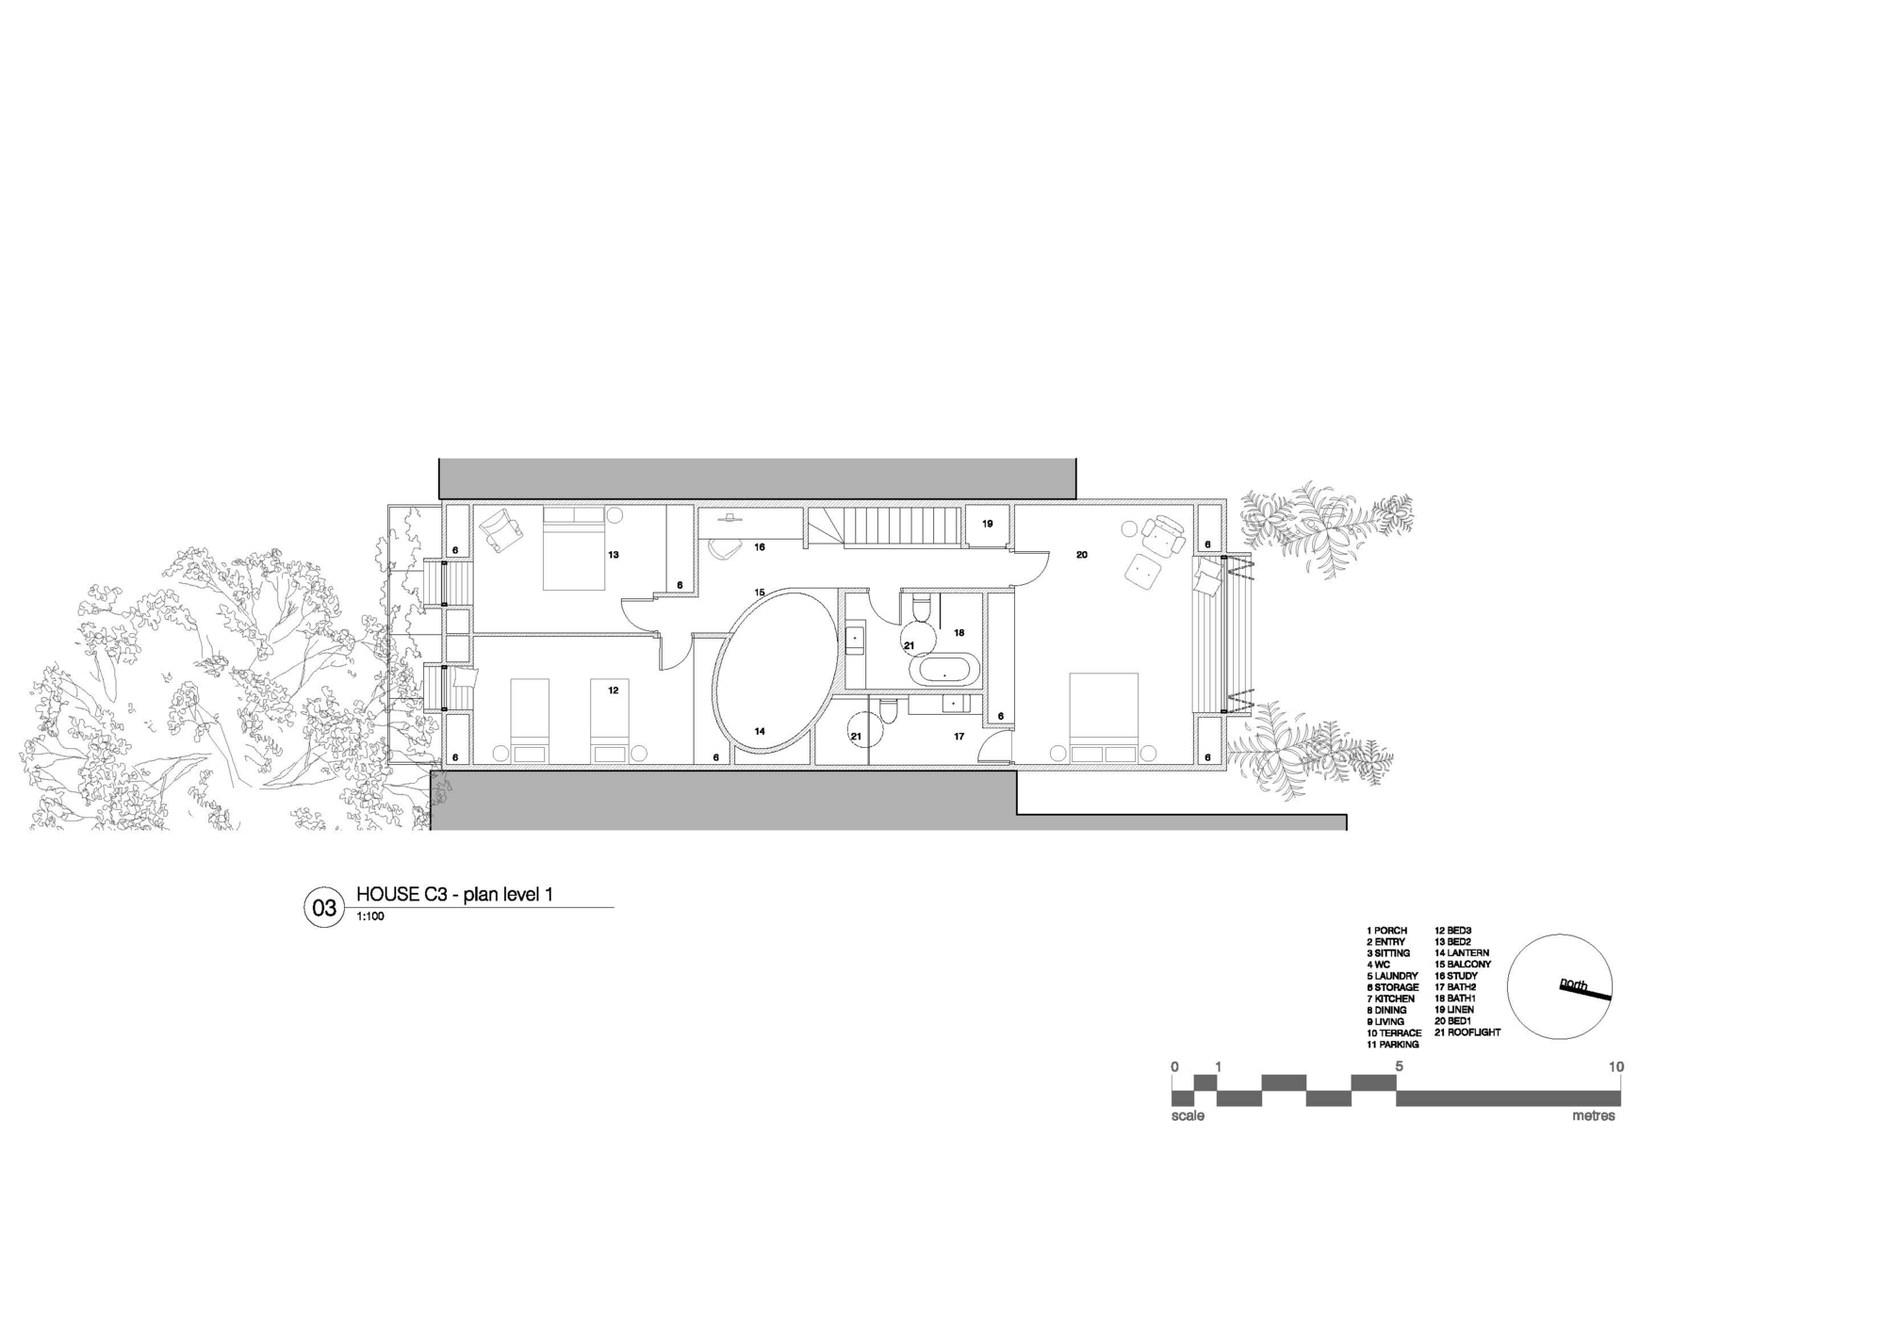 150508_House_C3_15